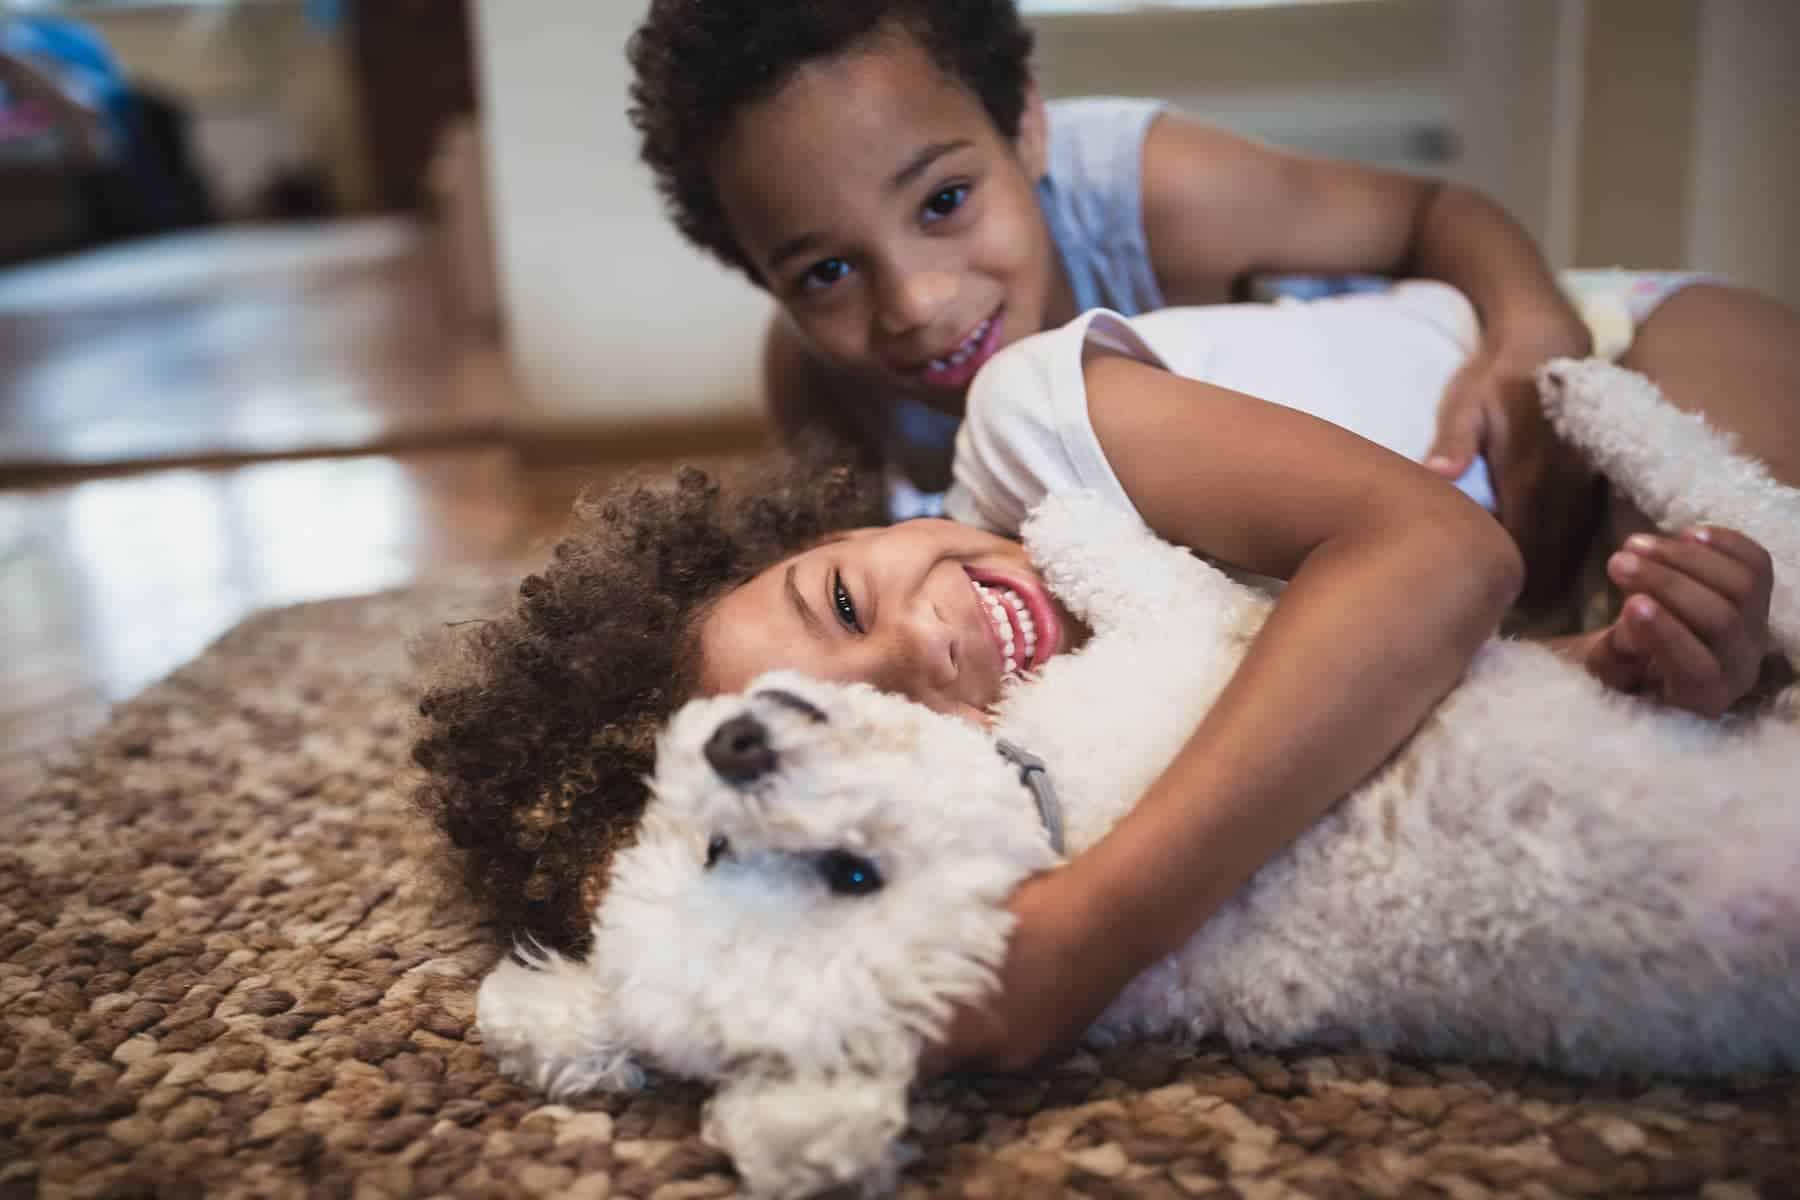 Slider_children with dog on carpet_1800x1200C